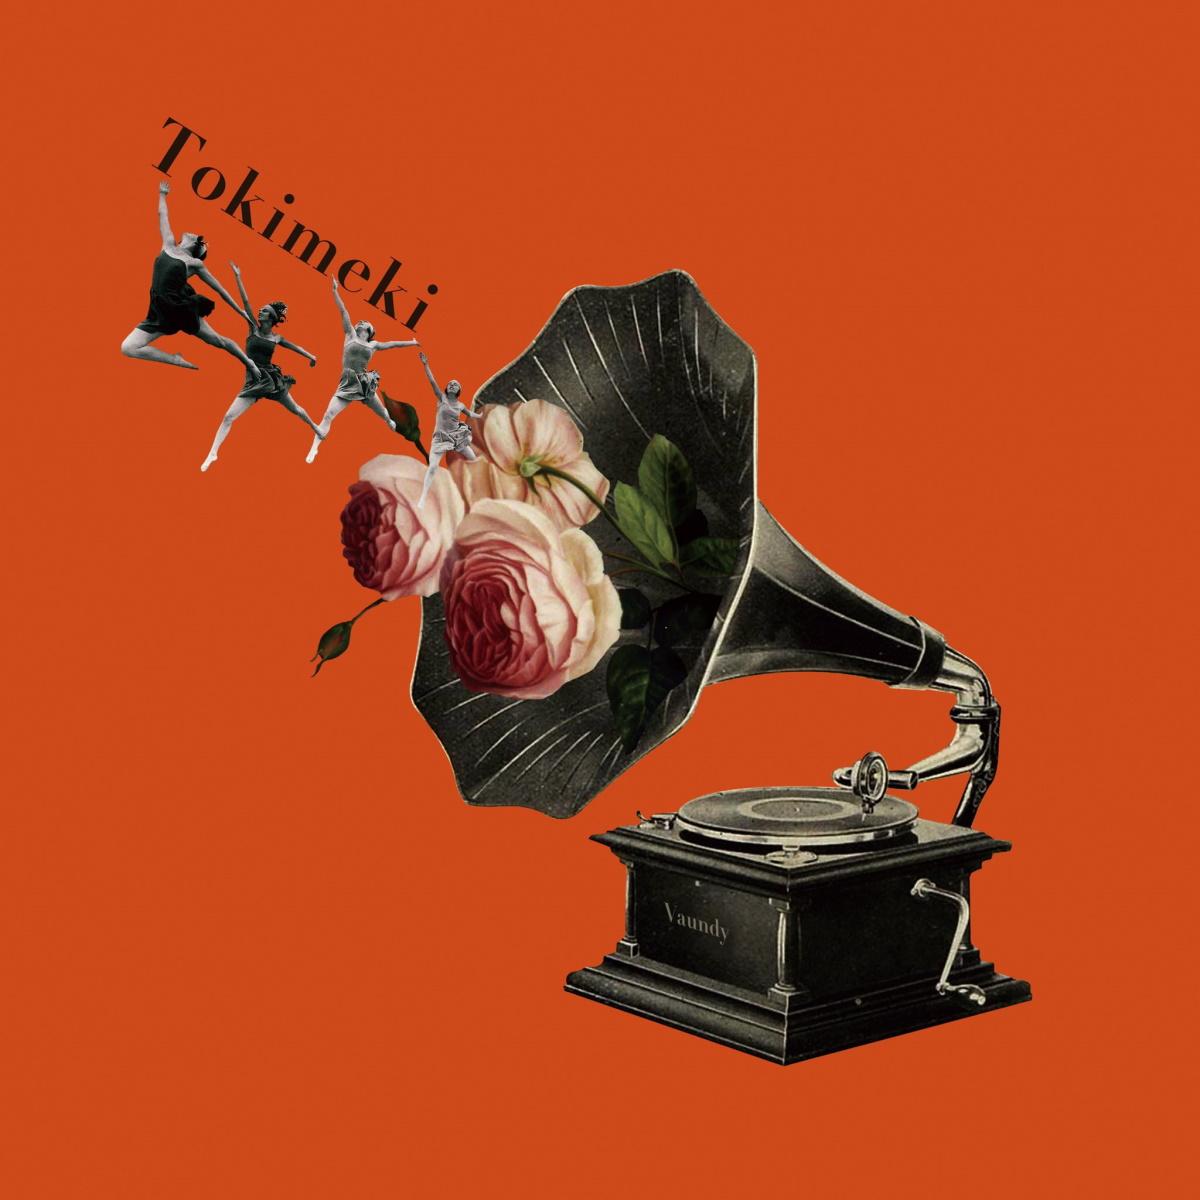 Cover image of『VaundyTokimeki』from the Album『』